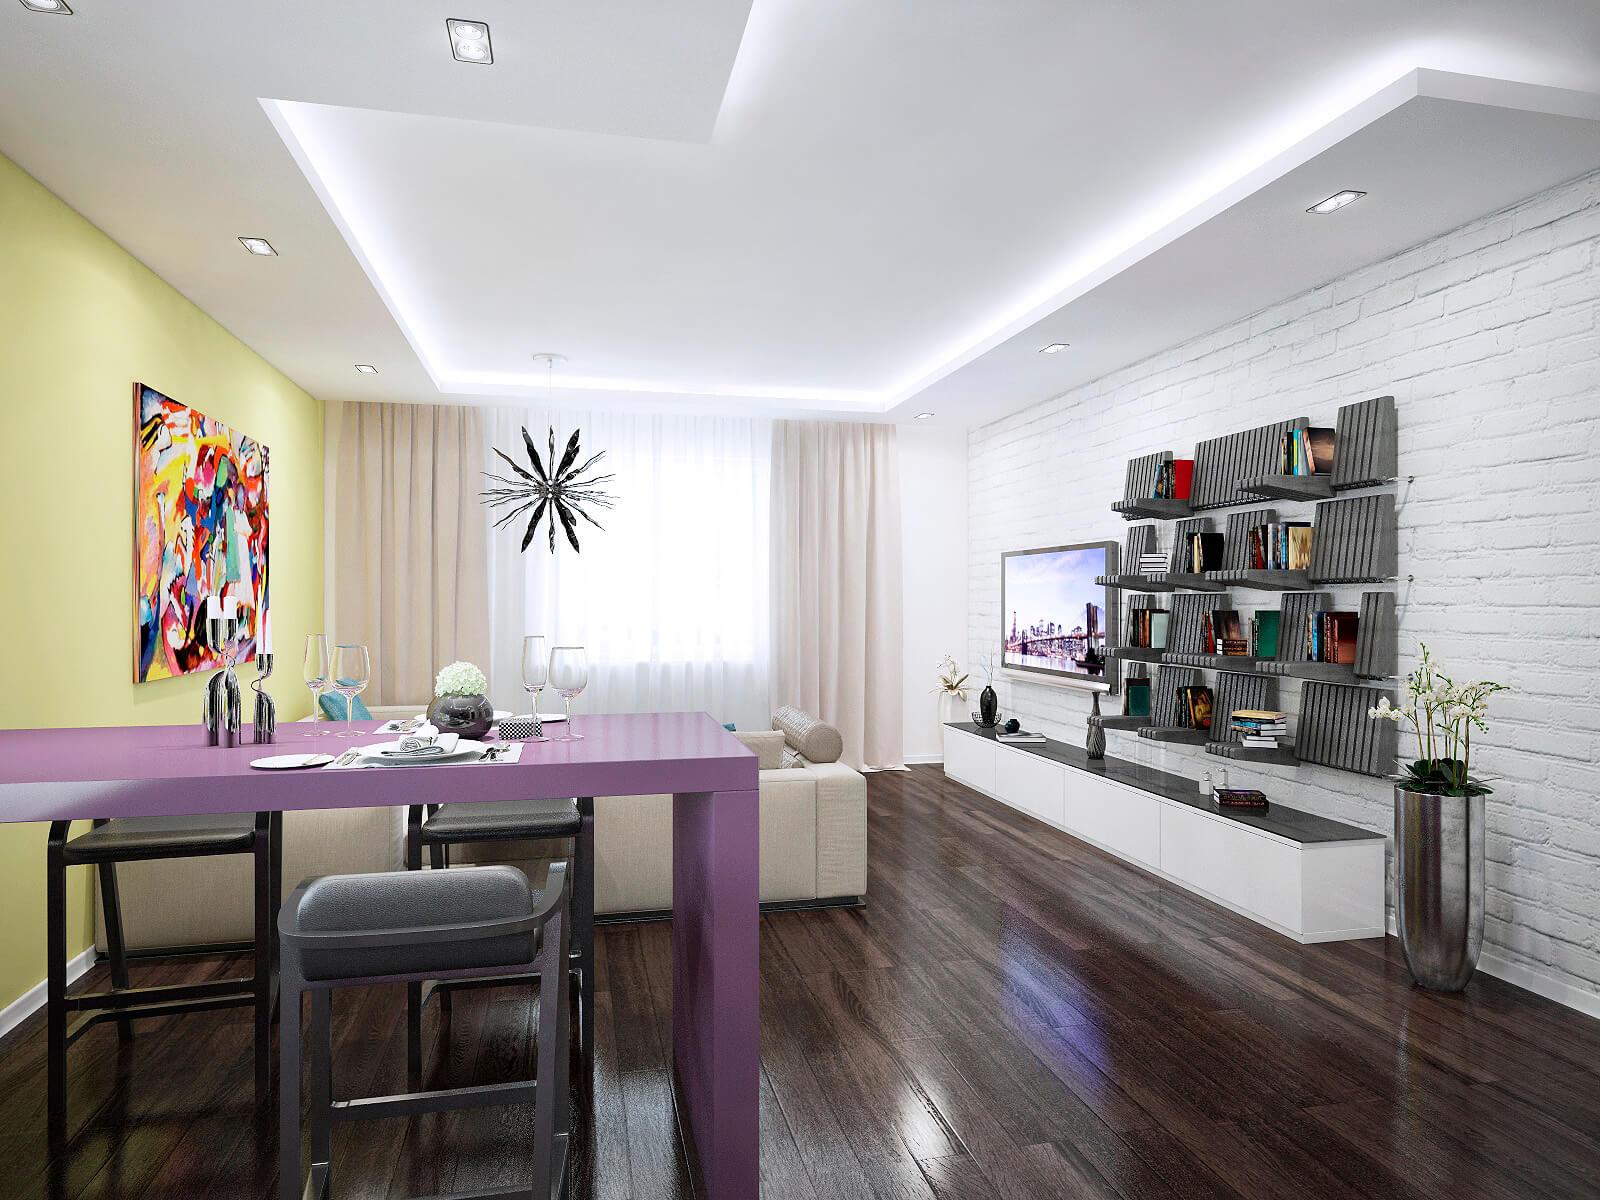 Дизайн трехкомнатной квартиры 80 кв м